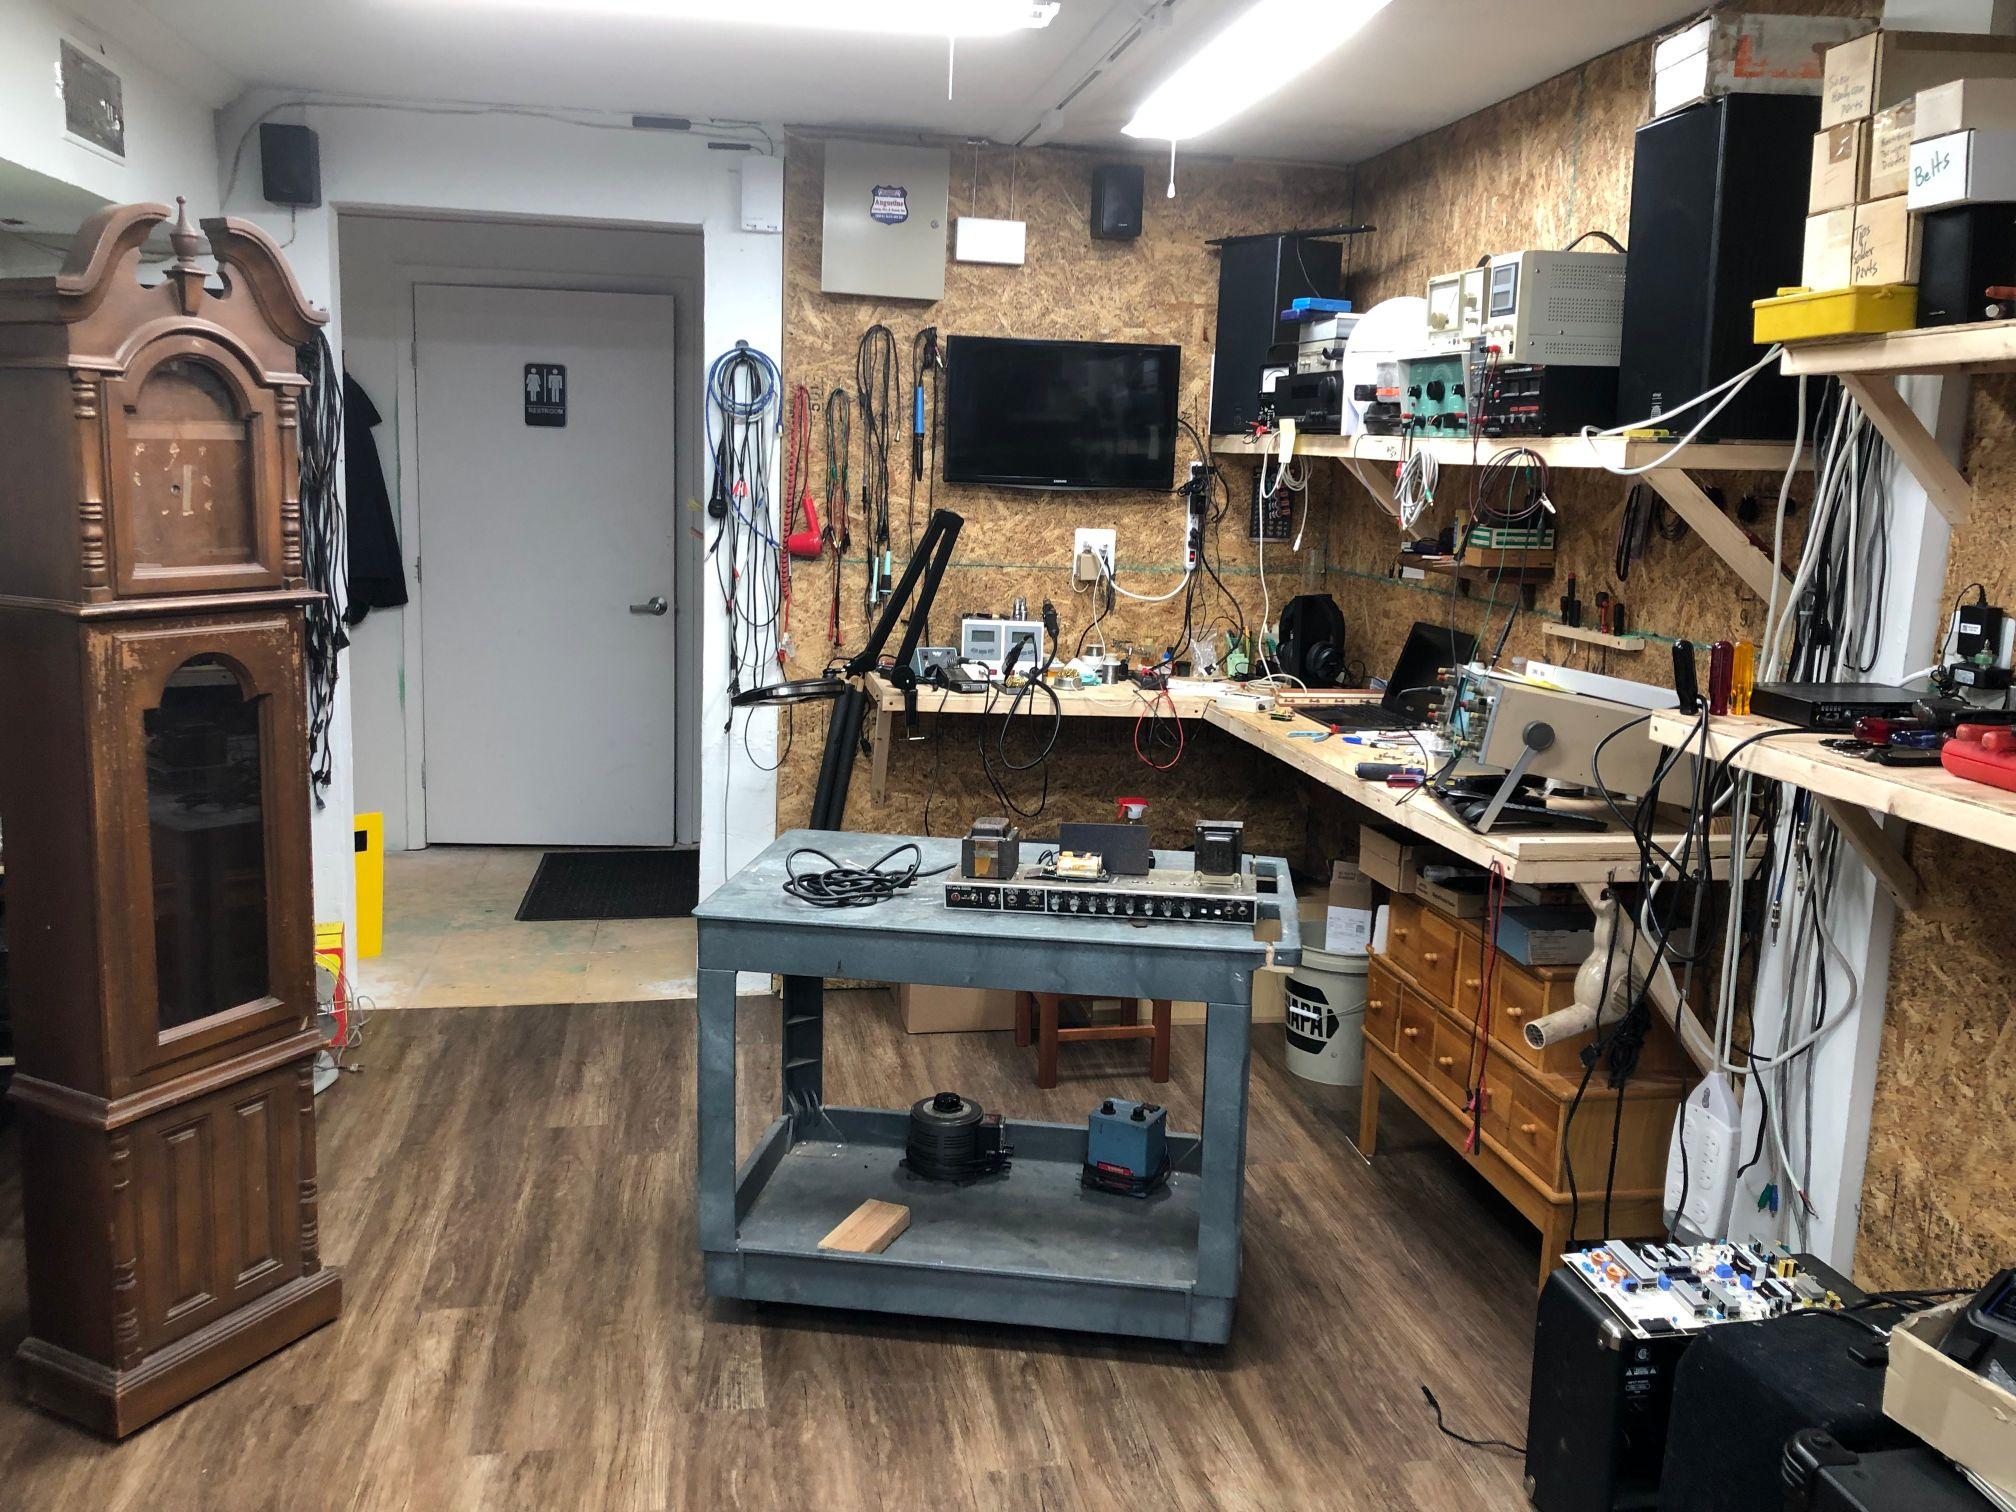 Nice Find Thriftique Inside Store